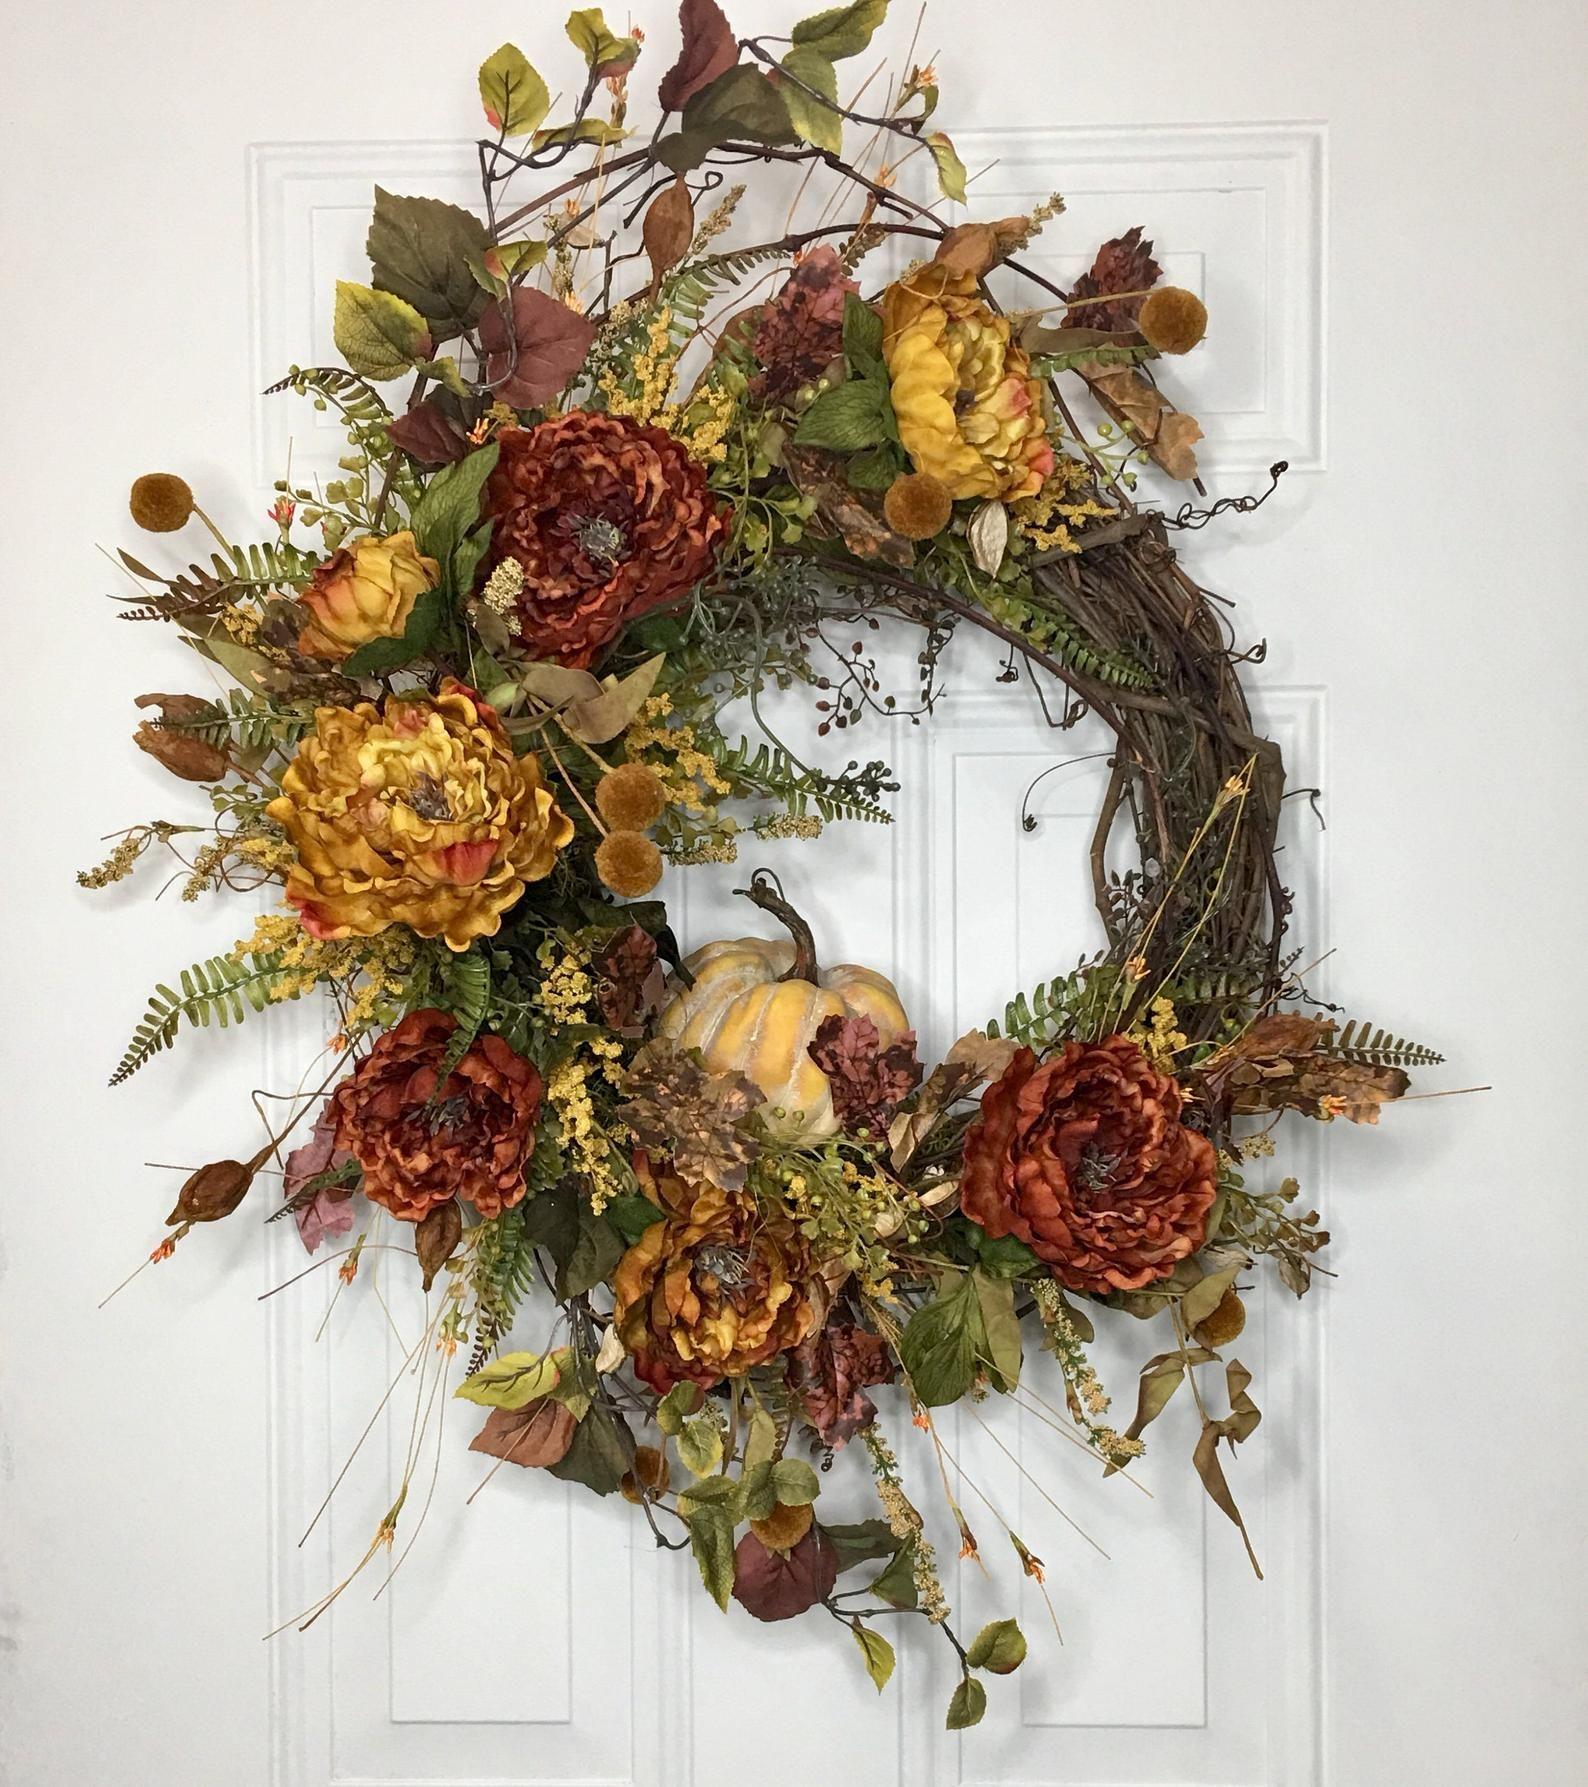 Photo of Fall Pumpkin Wreath, Autumn Wreath, Harvest Wreath, Fall Floral Wreath, Fall Grapevine Wreath